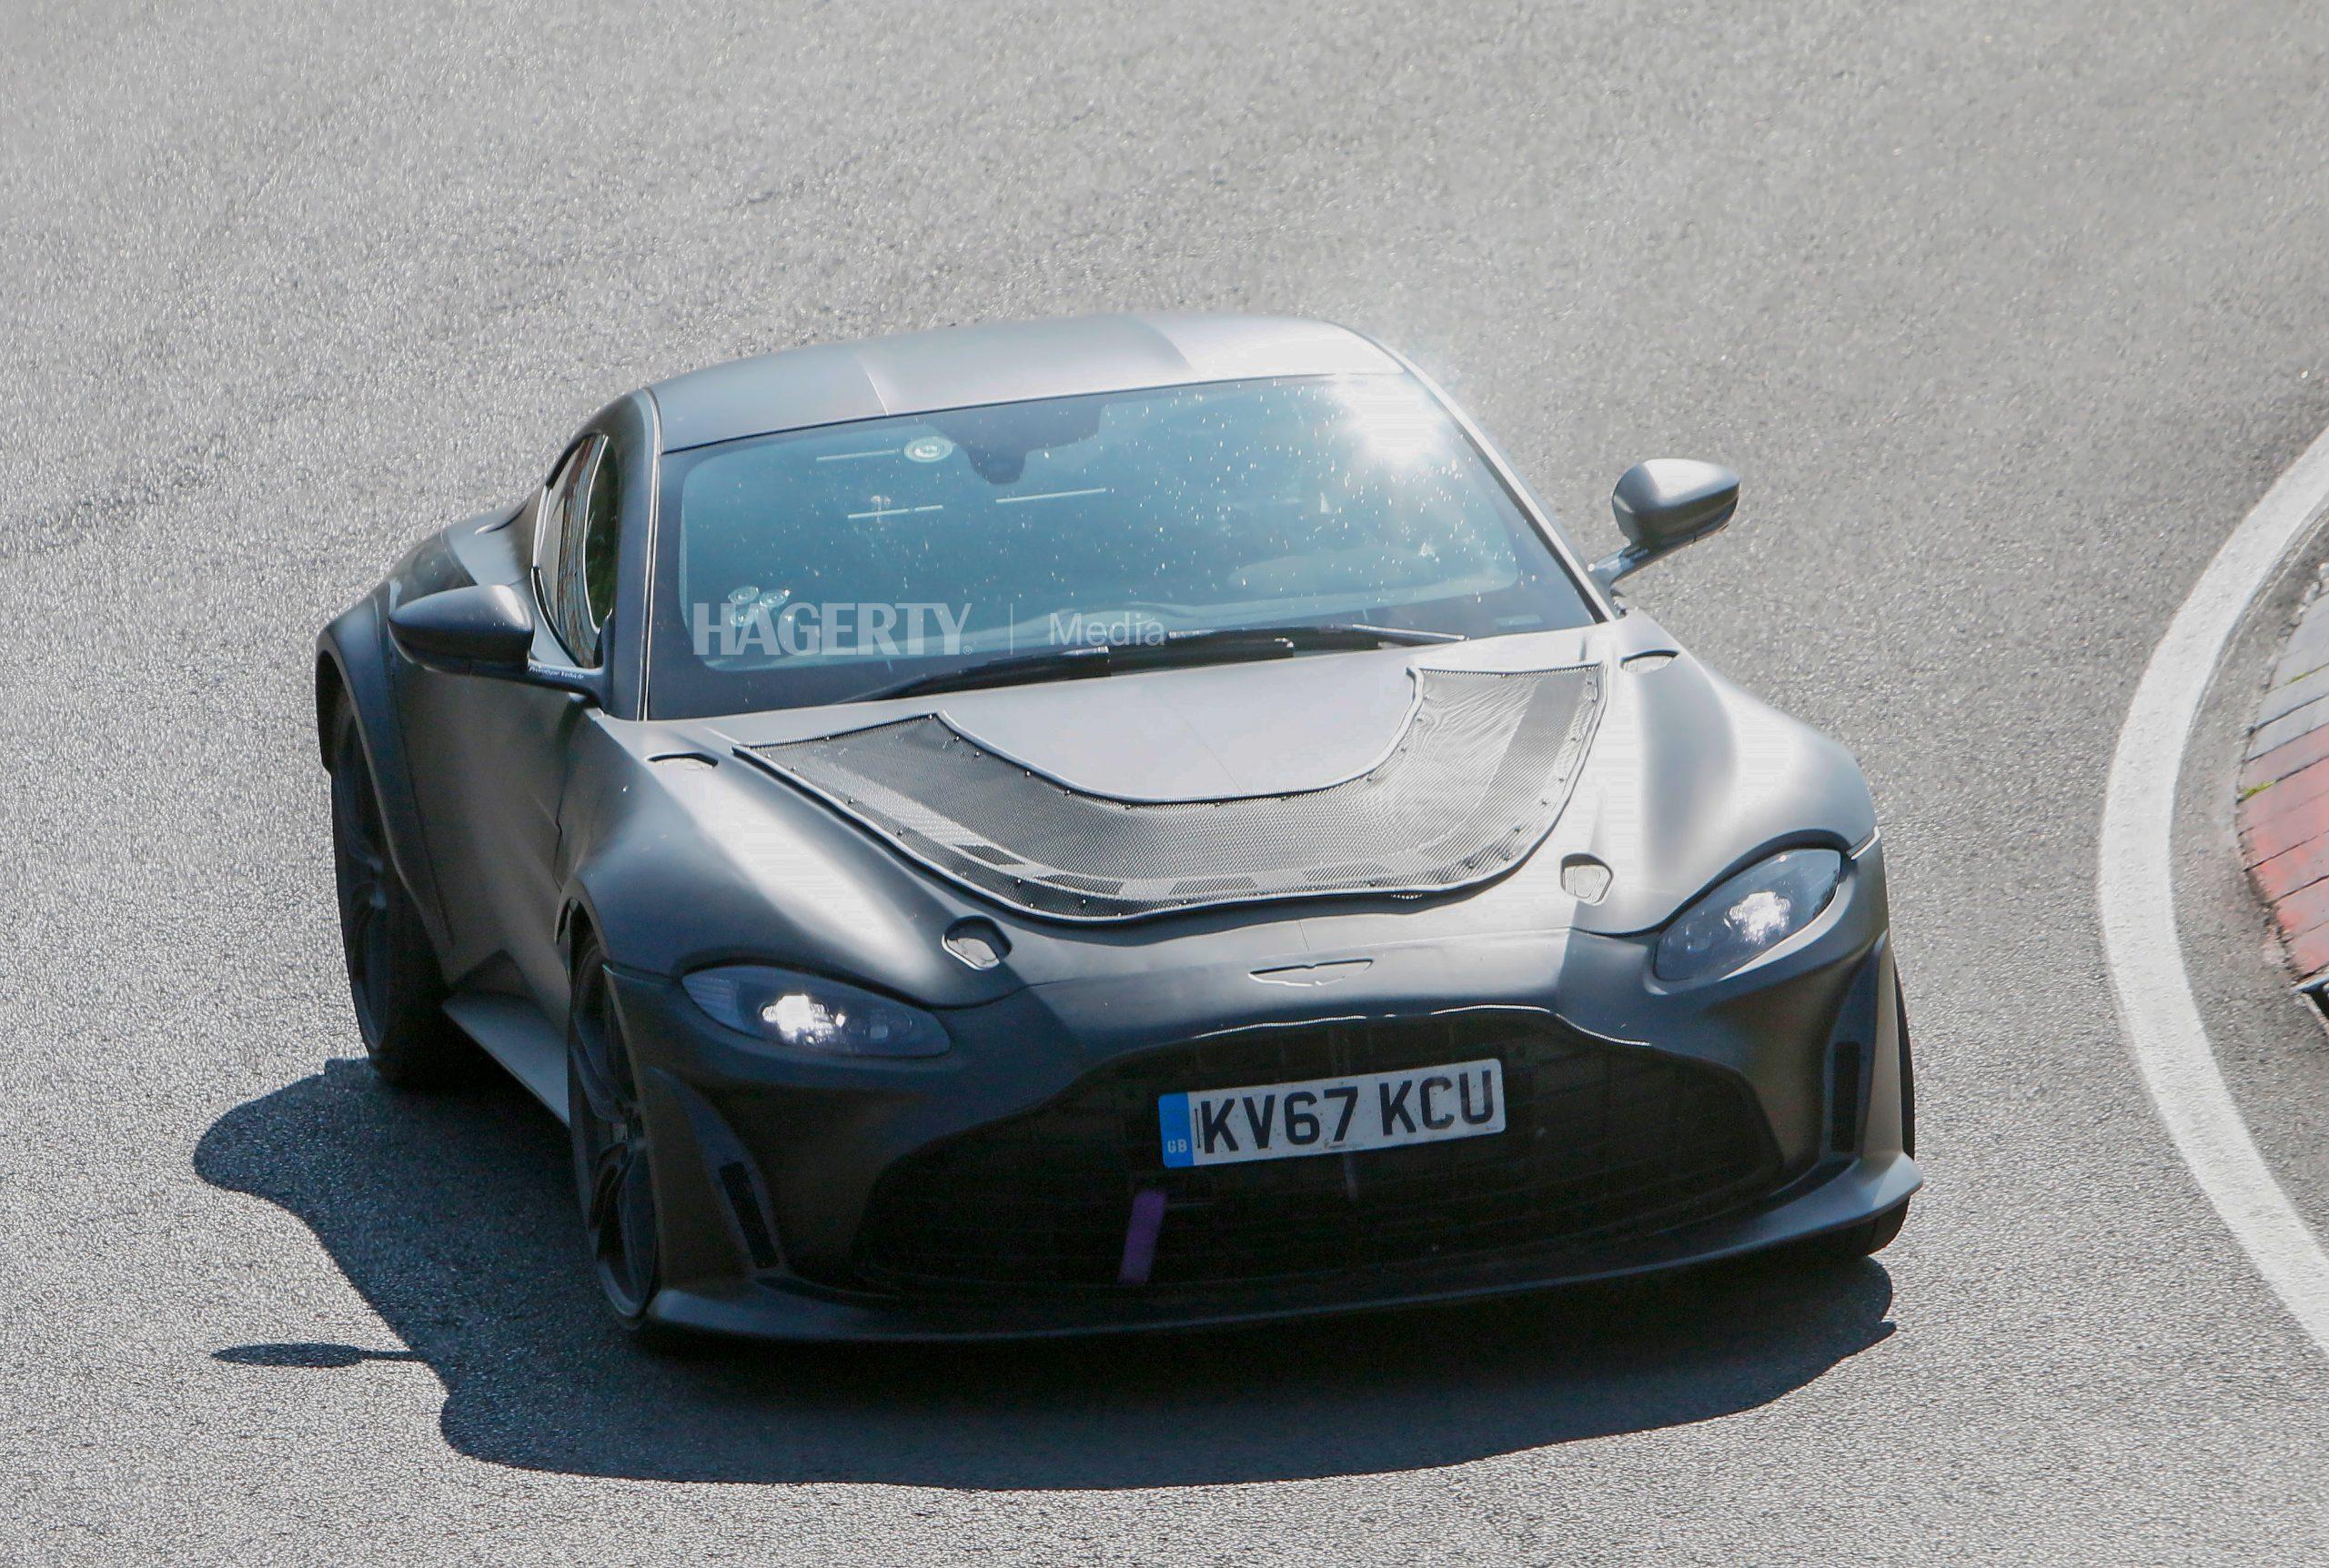 Aston Martin Vantage mule spy shot front three-quarter